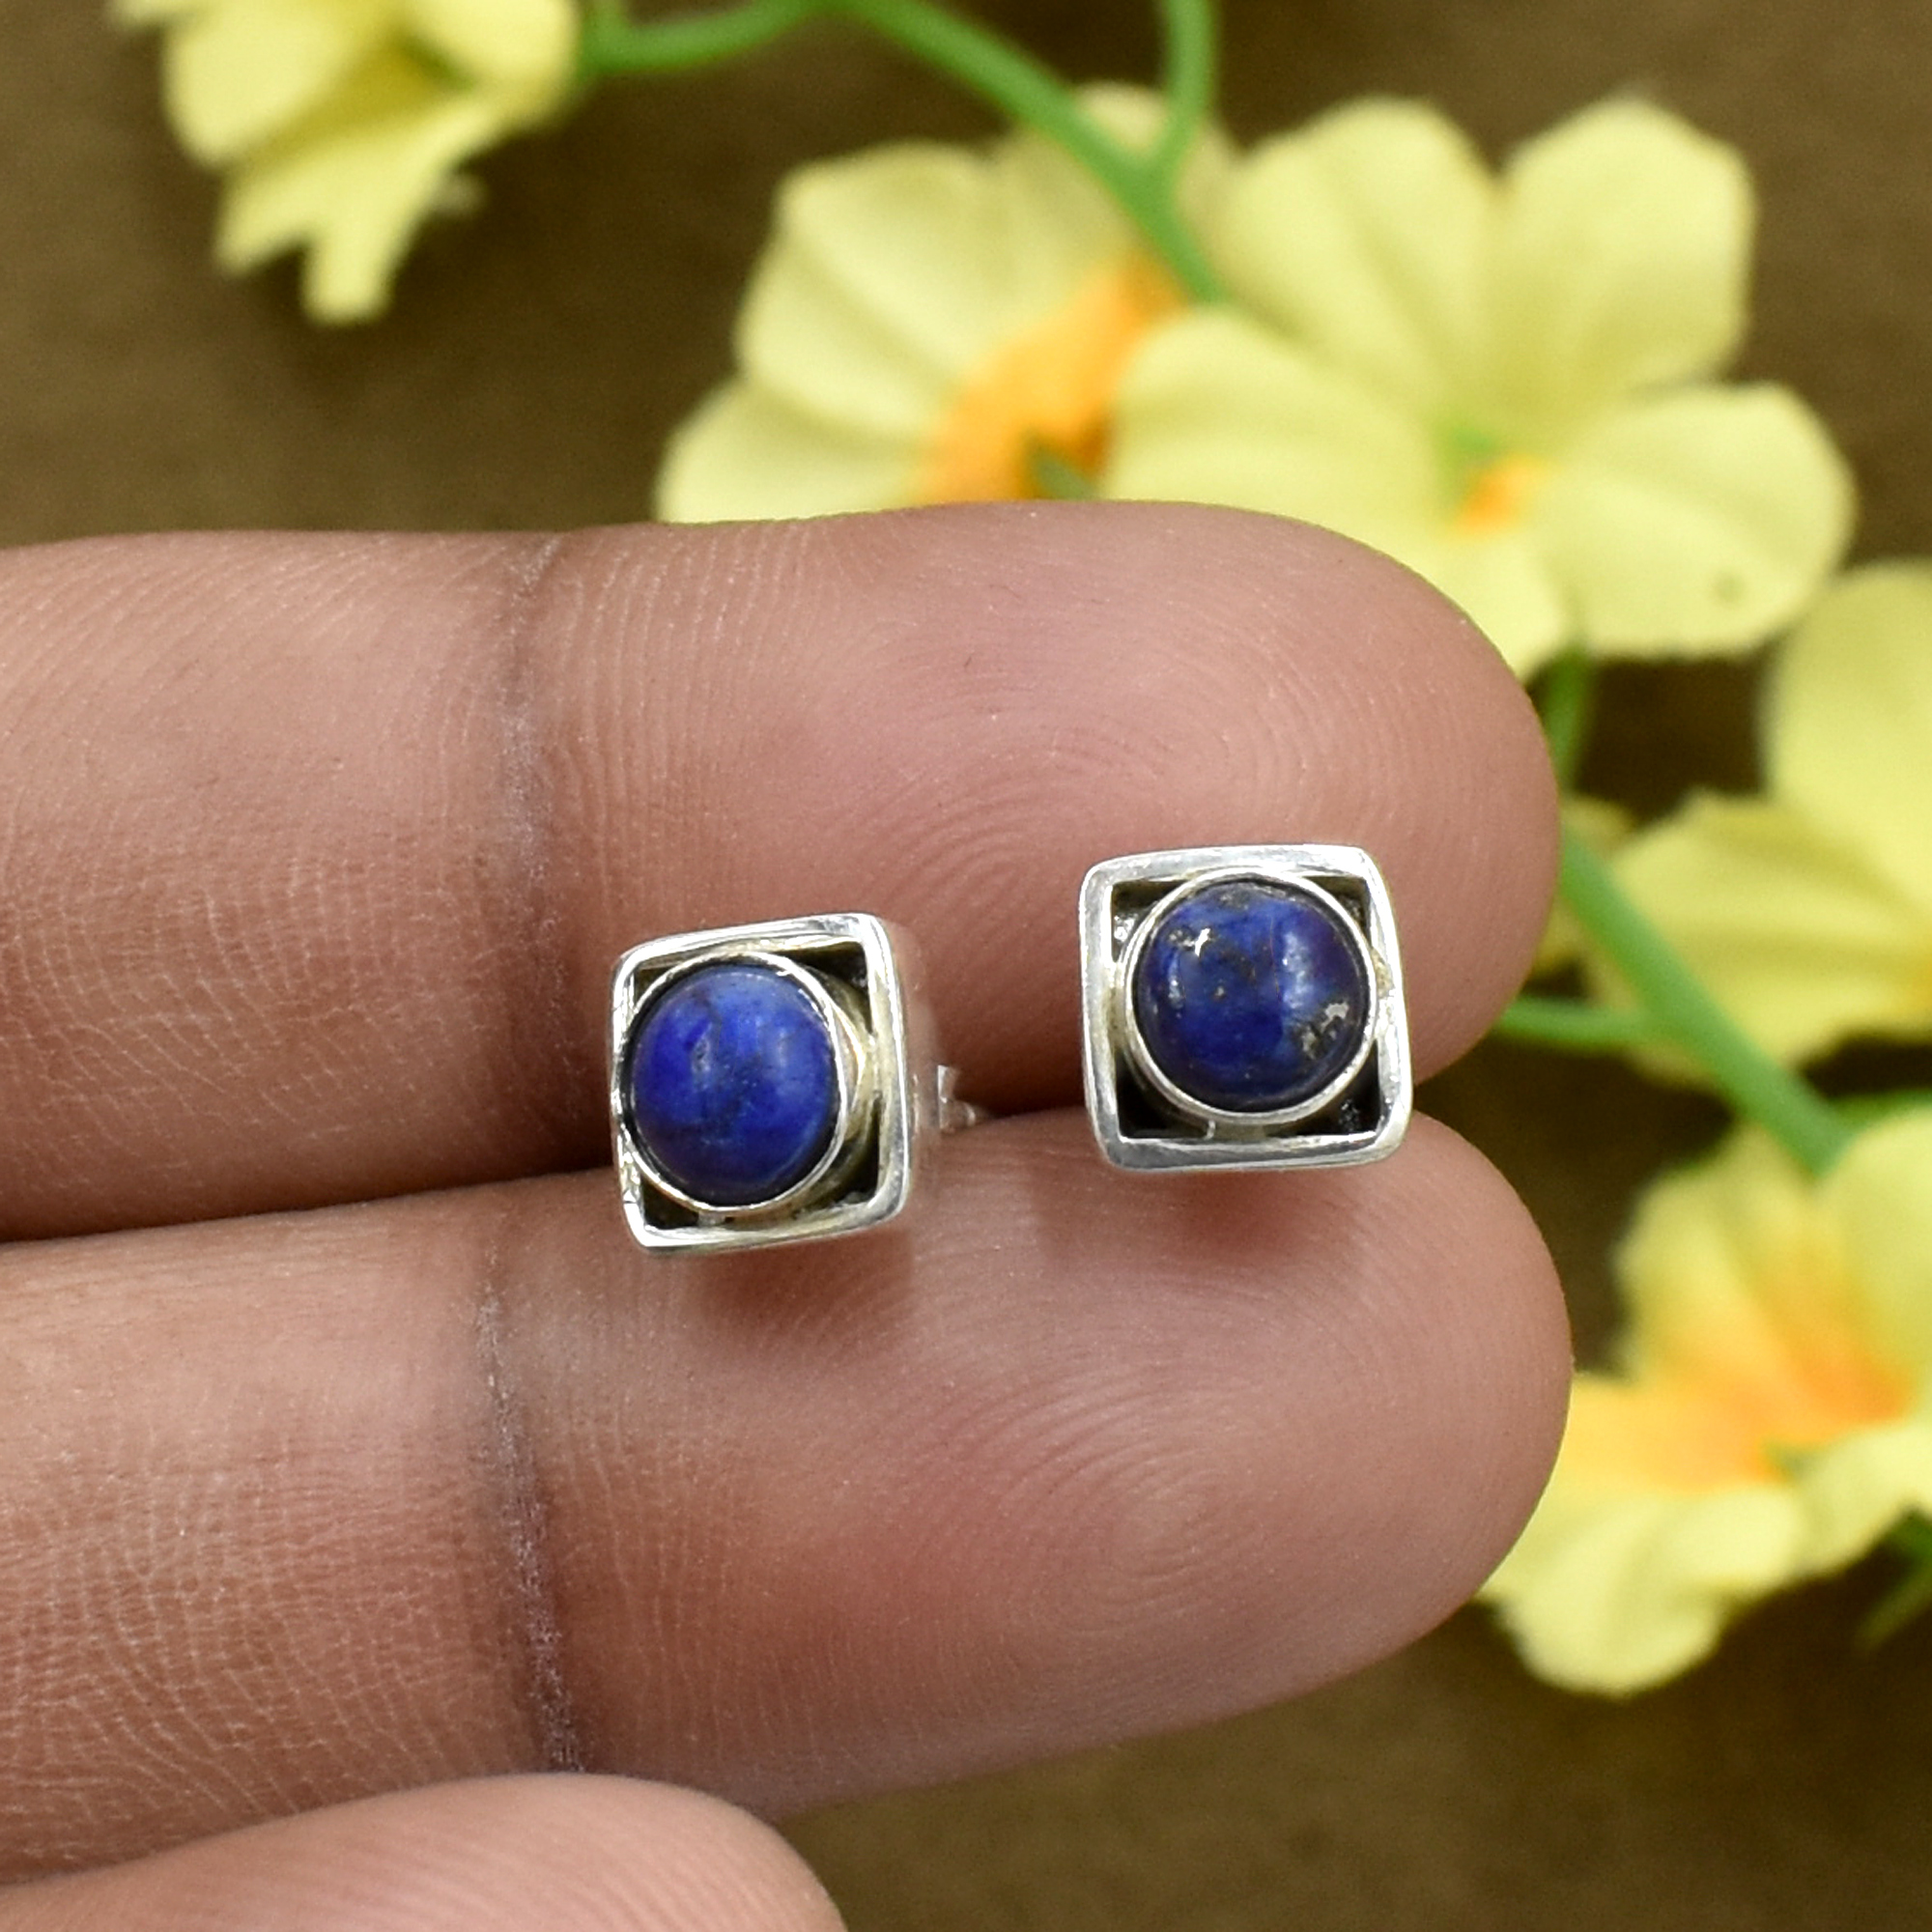 Natural Blue Lapis Lazuli Gemstone Light Weight Earring 925 Sterling Silver Stud For Women & Girls